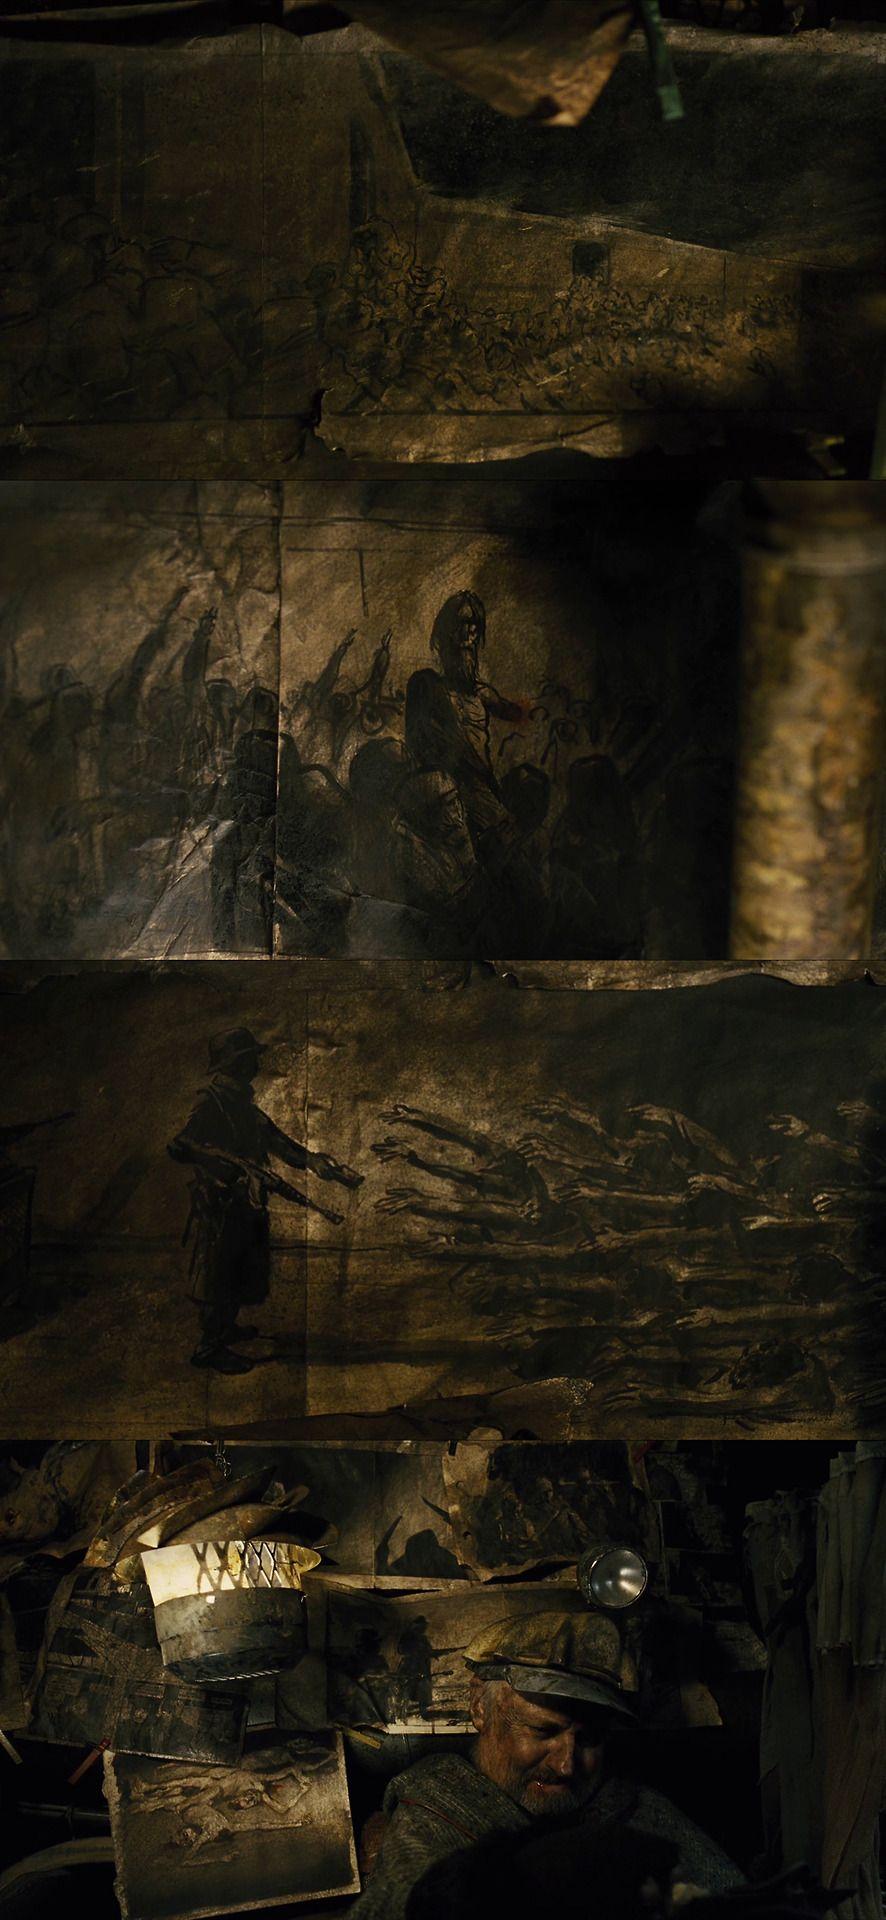 Snowpiercer Clark Middleton Science Fiction Film Cinematography Composition Cinematography